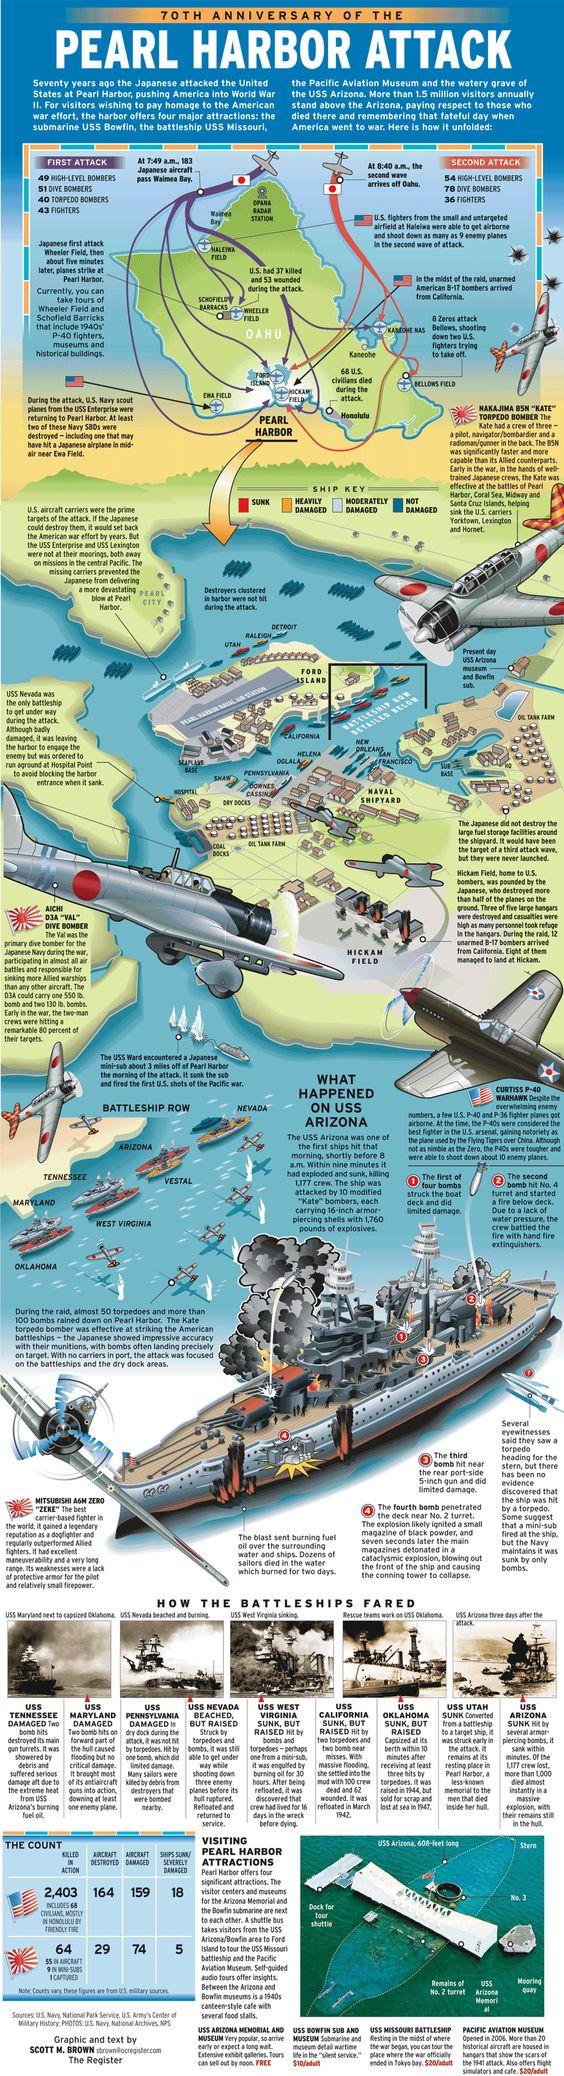 70th Anniversary of the Pearl Harbor Attack